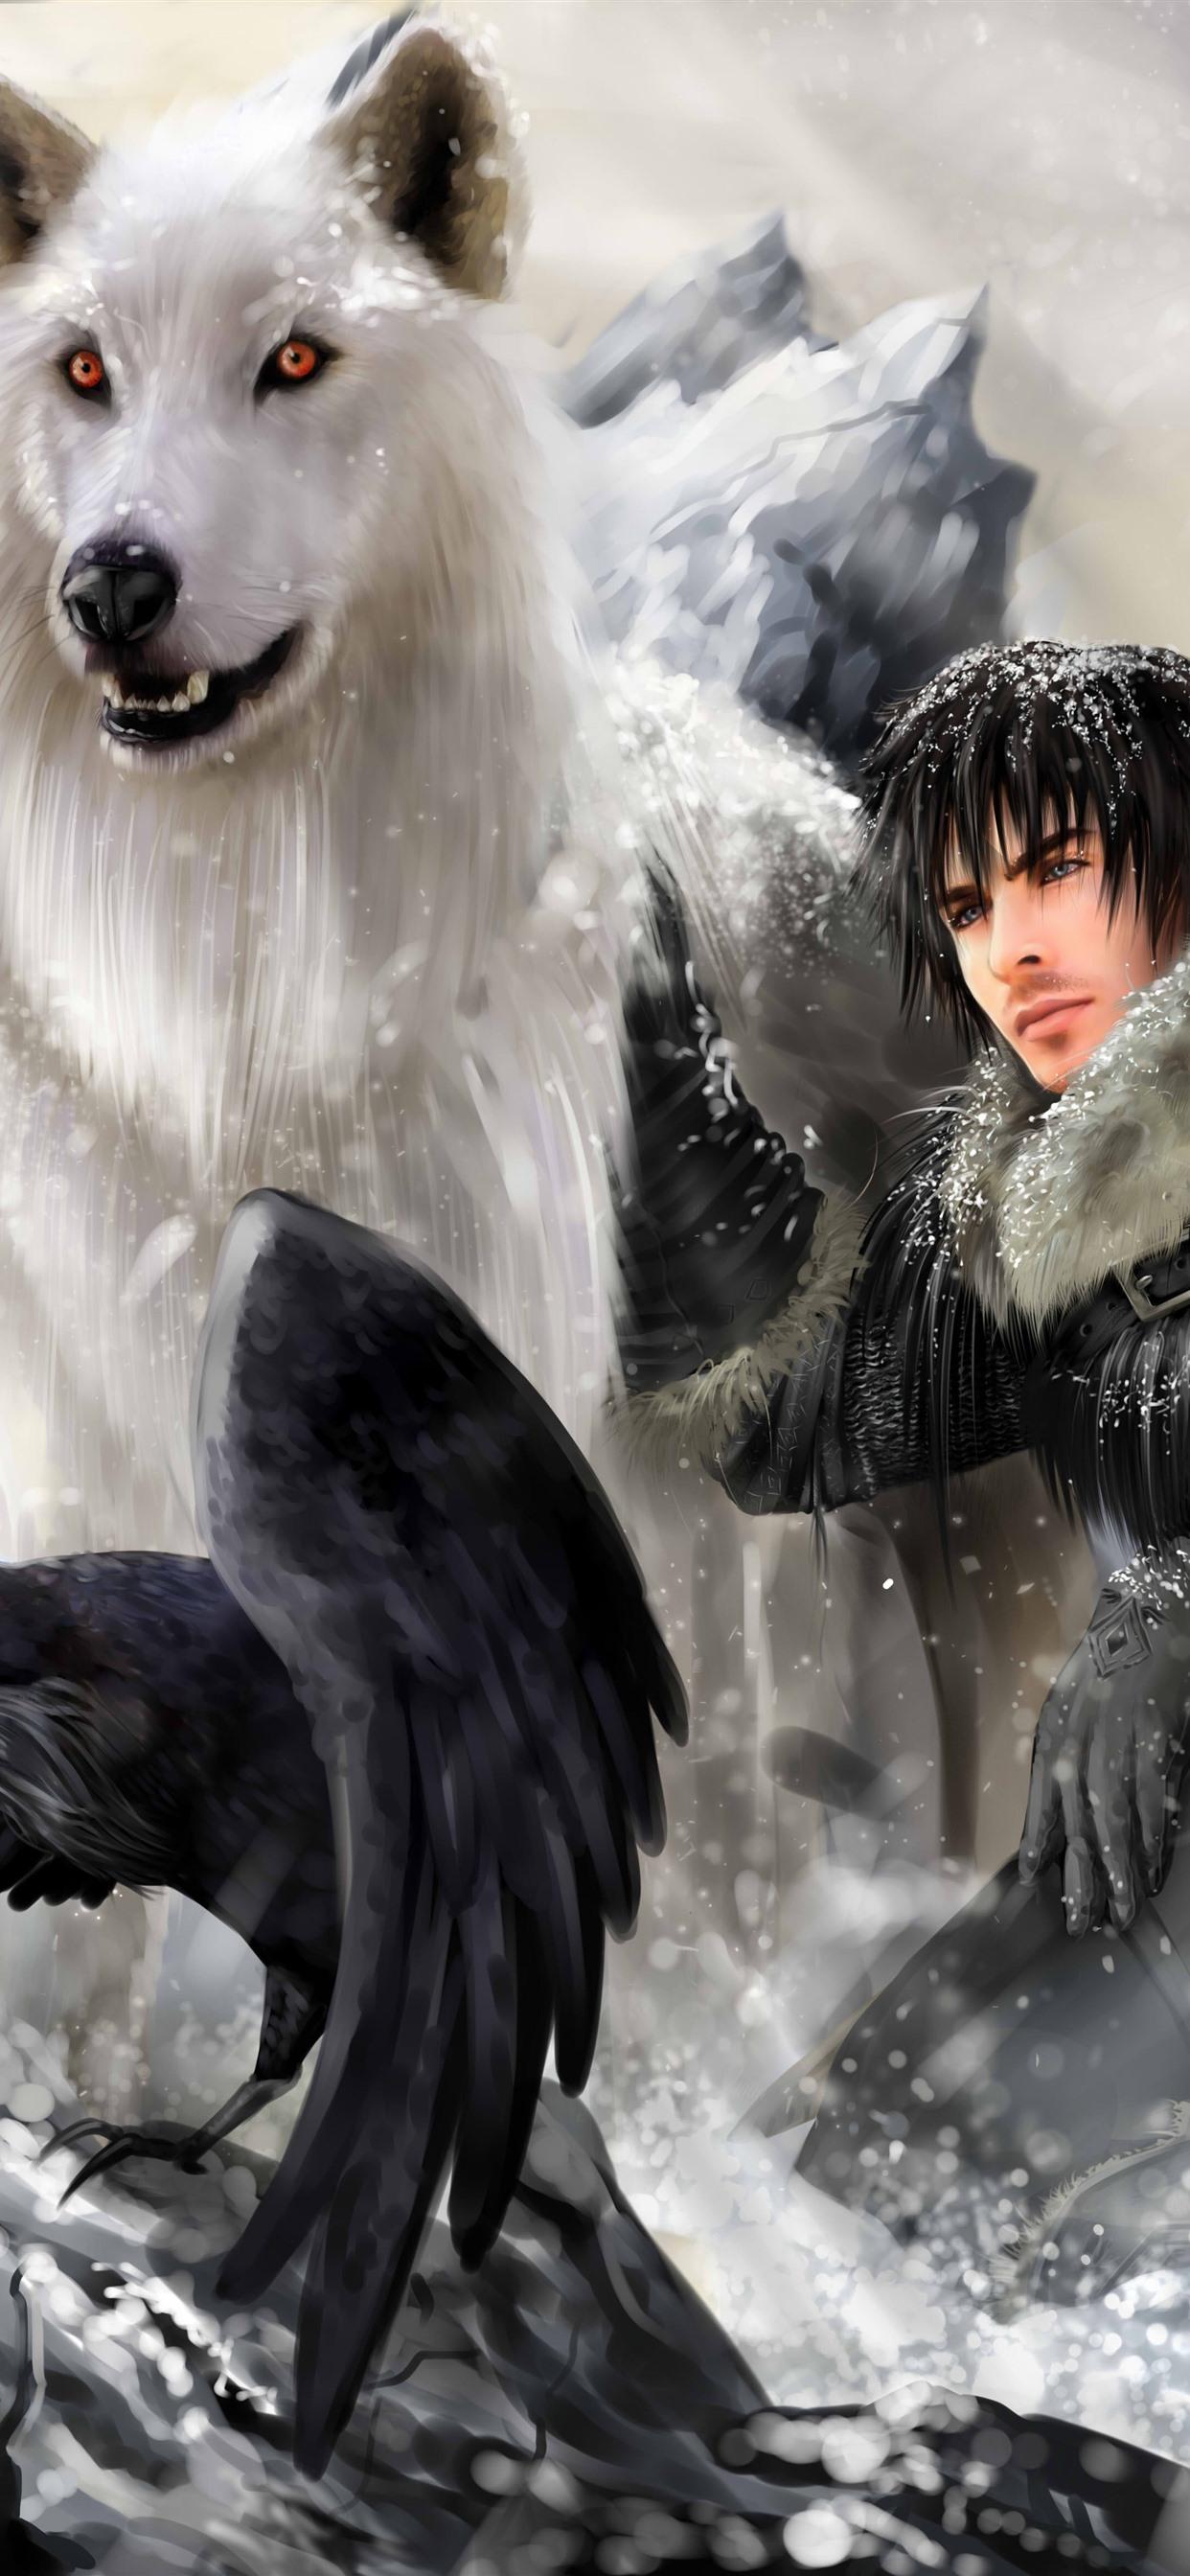 Game Of Thrones Wolf Man Bird Art Picture 1242x2688 Iphone 11